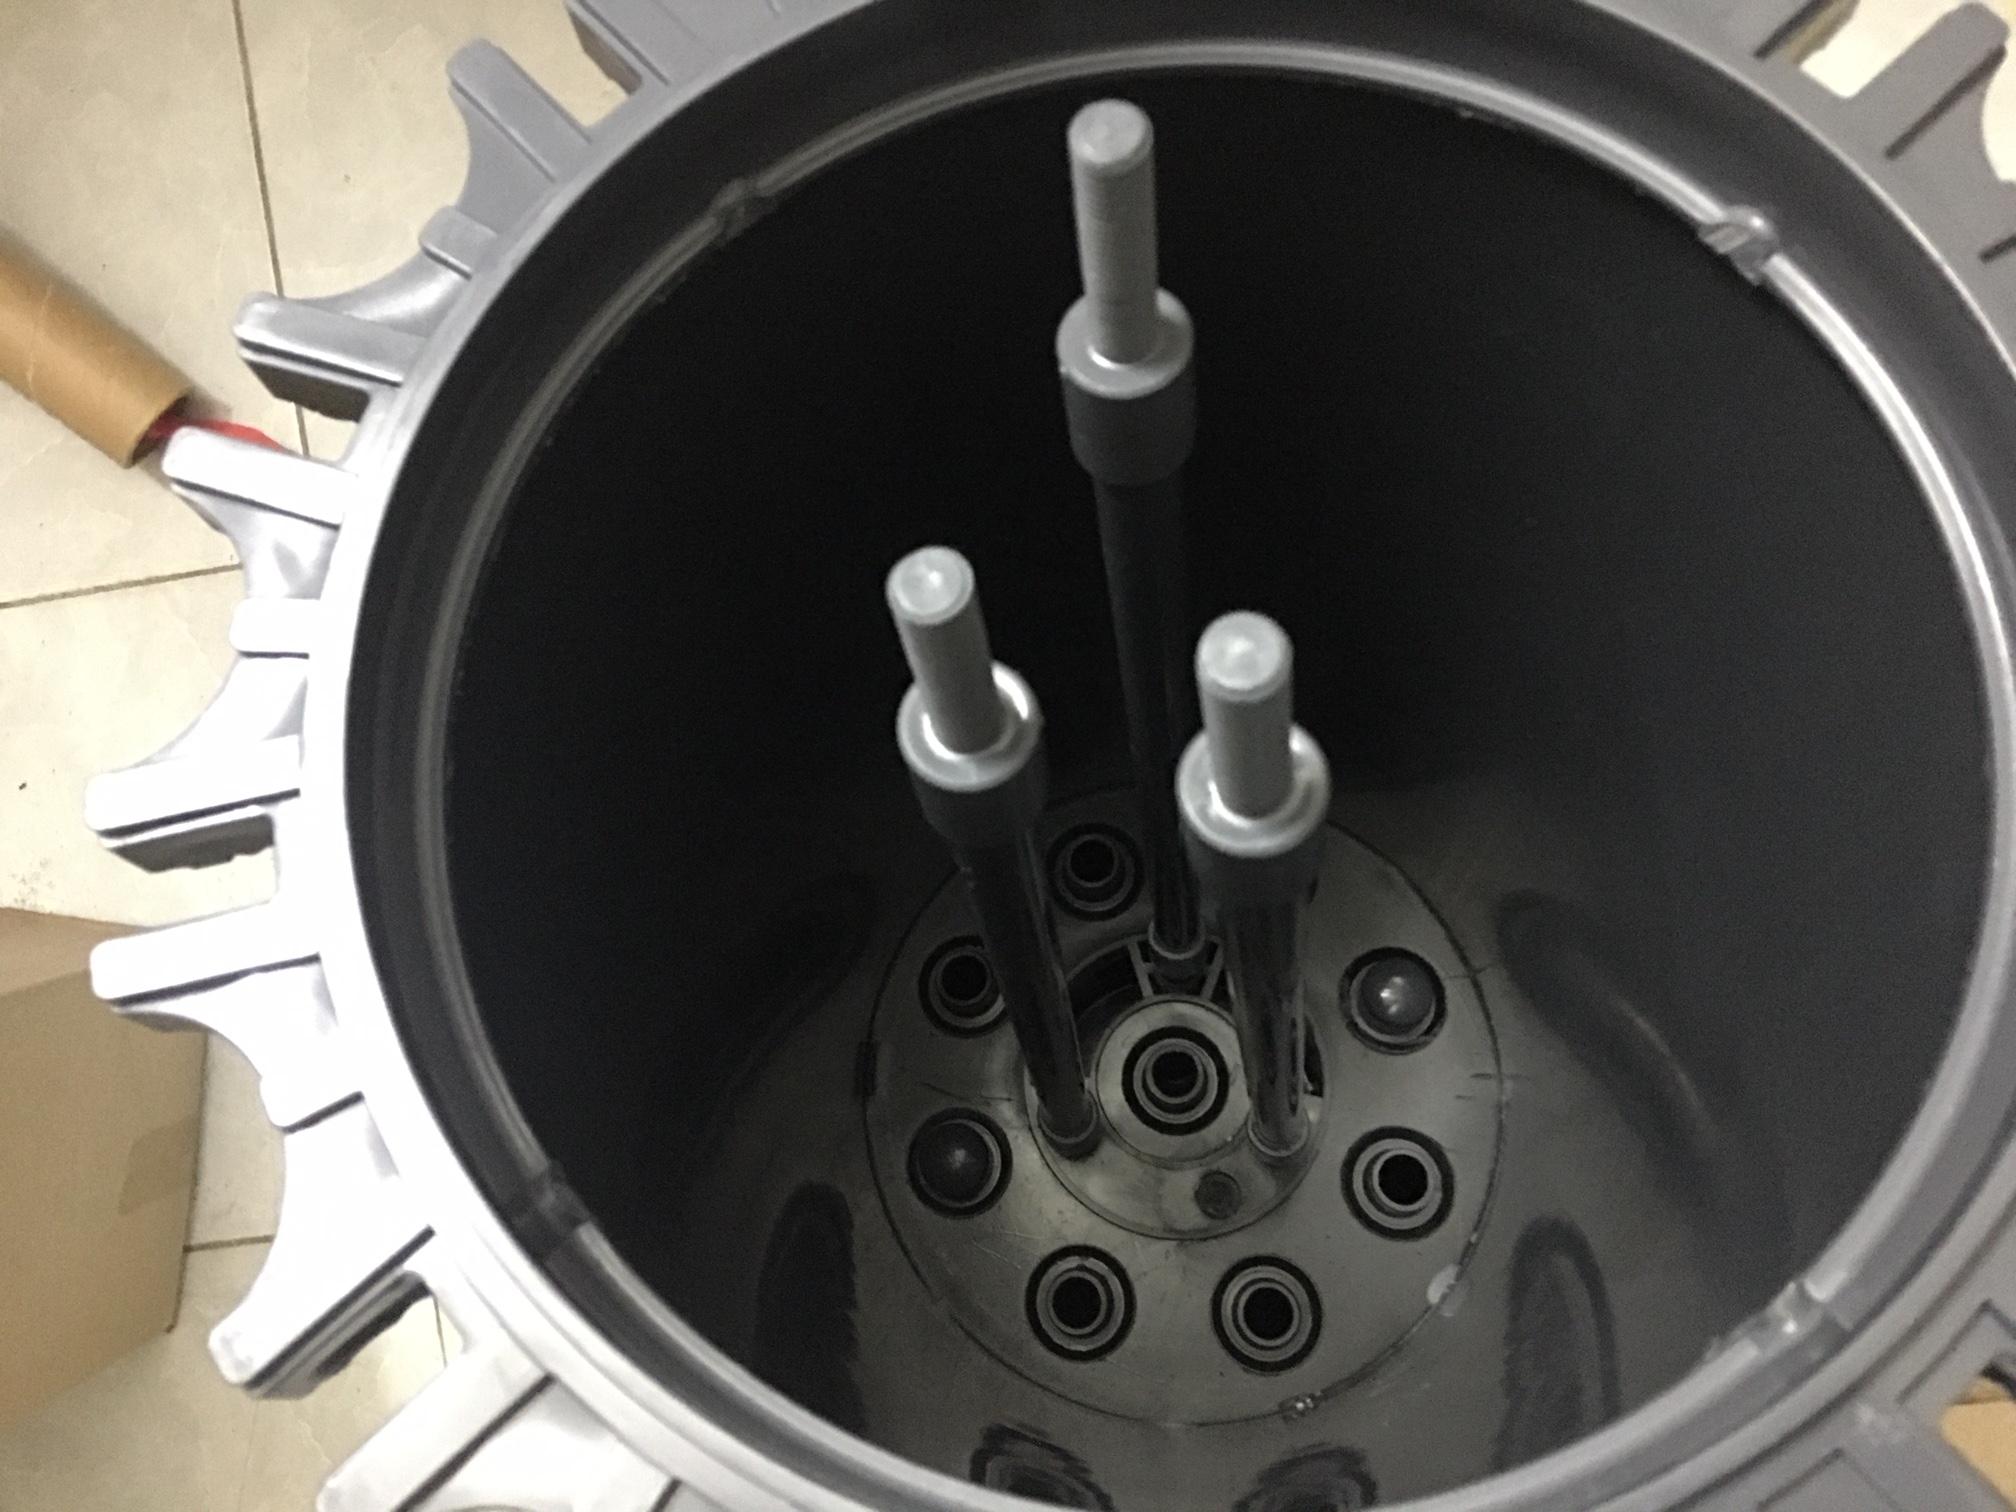 Bình nhựa lọc lõi uPVC 9 lõi 20 inch